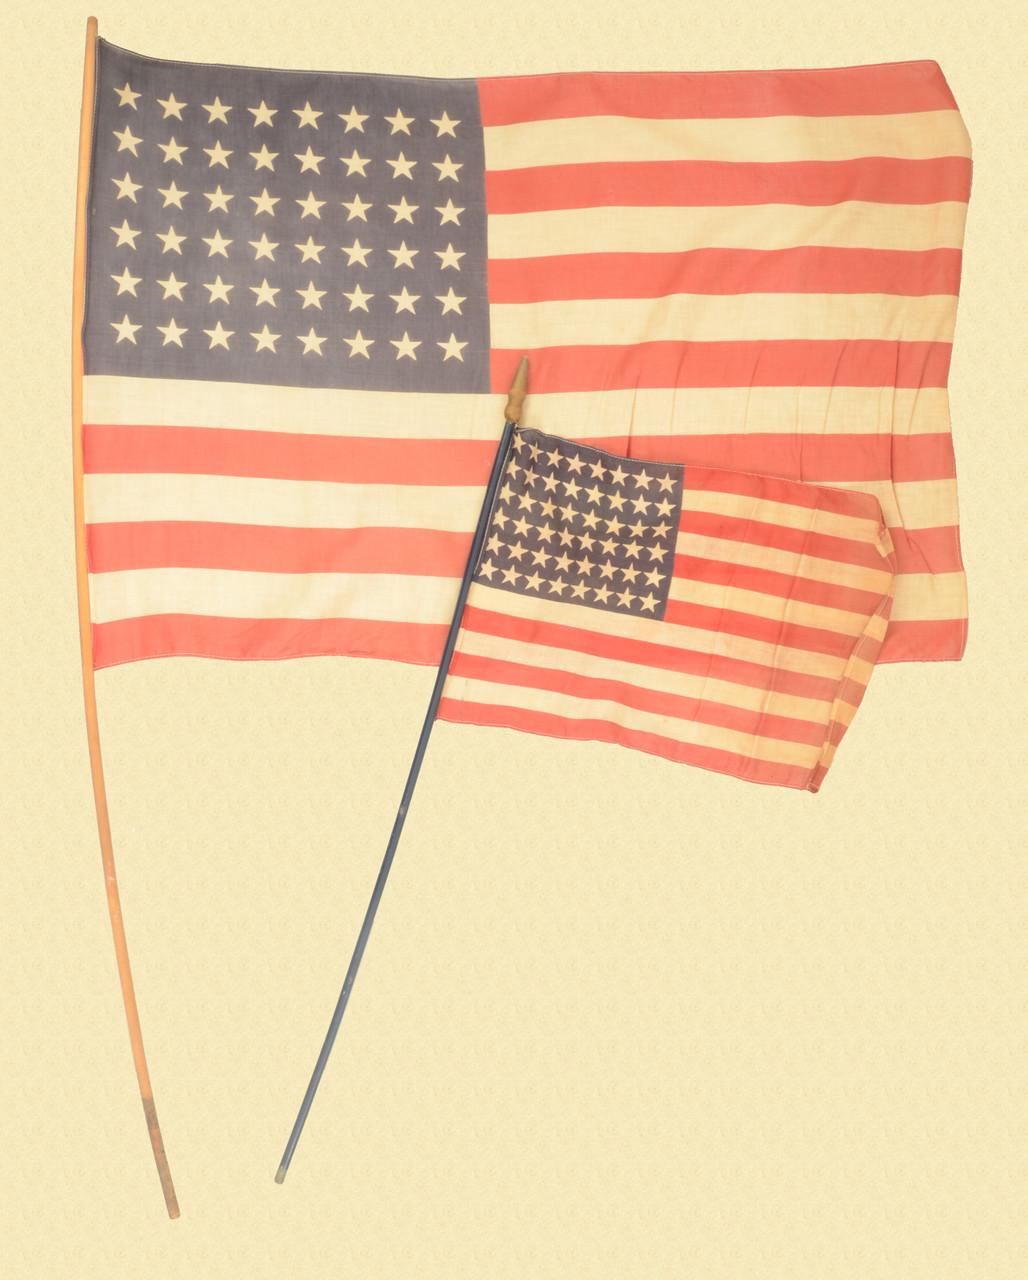 USA 48 STAR FLAGS - C48412